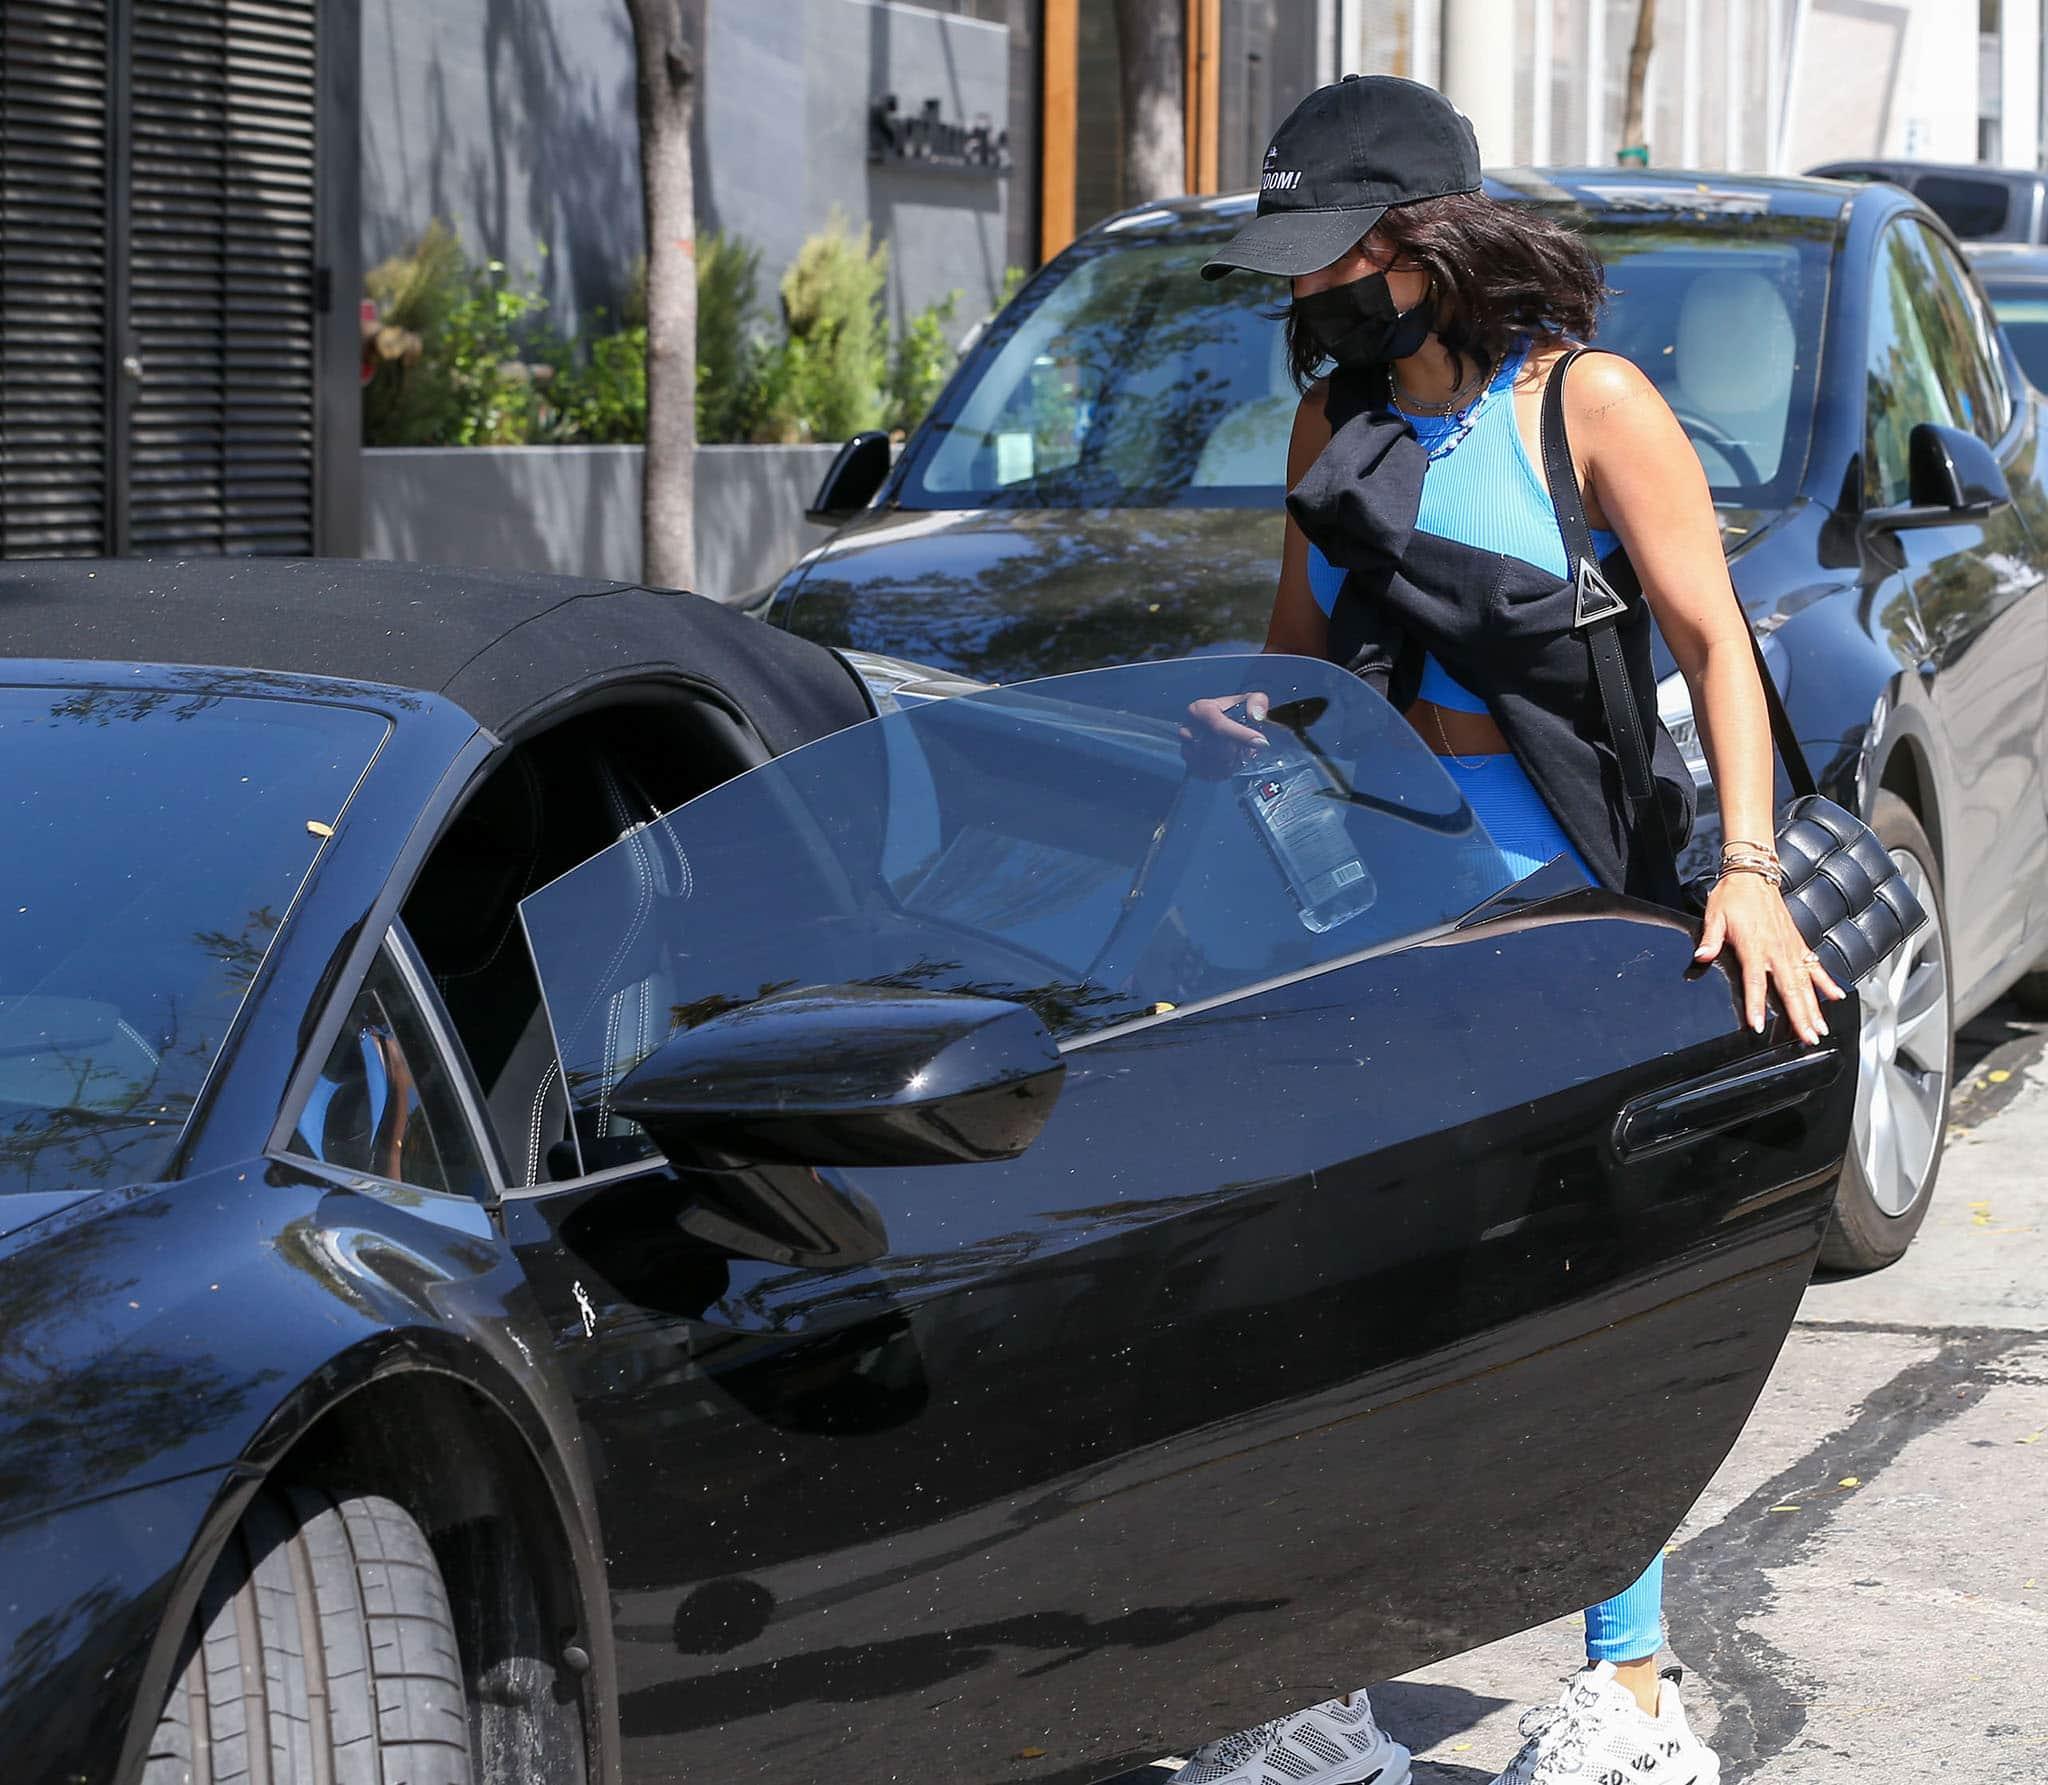 Vanessa Hudgens carries a Bottega Veneta bag as she gets in her black convertible car